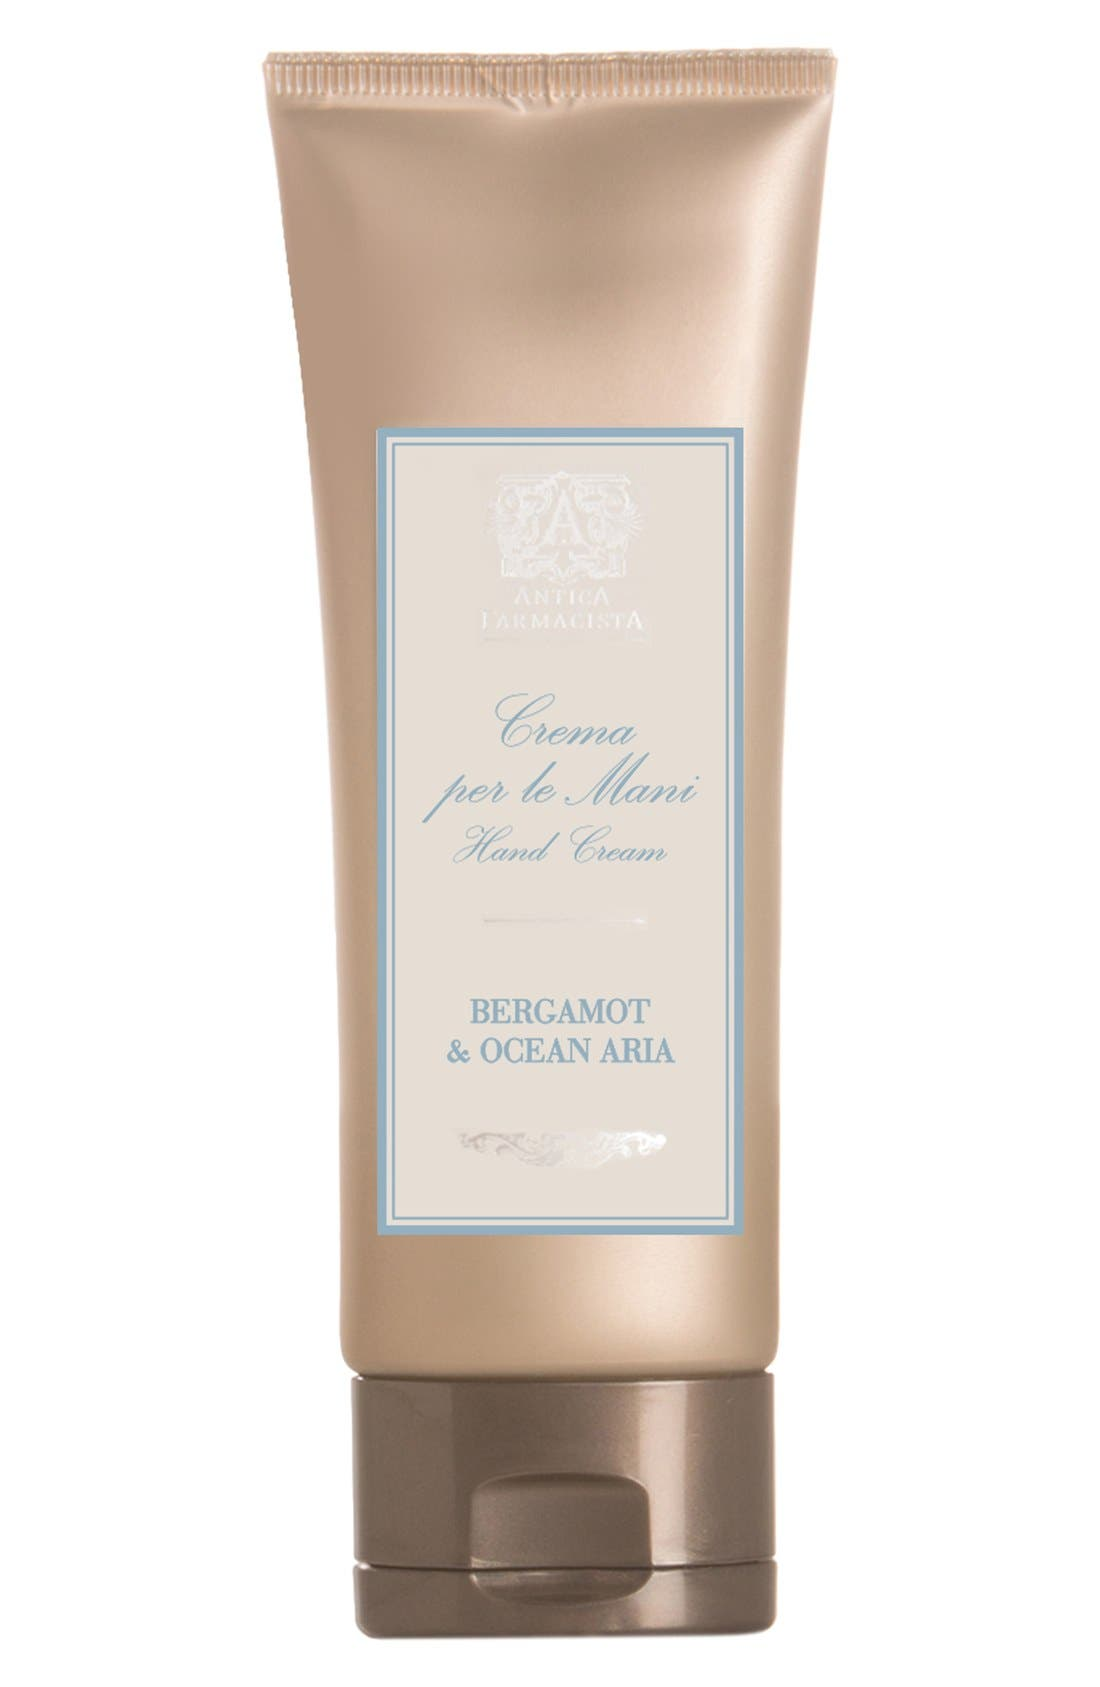 Antica Farmacista 'Bergamot & Ocean Aria' Hand Cream